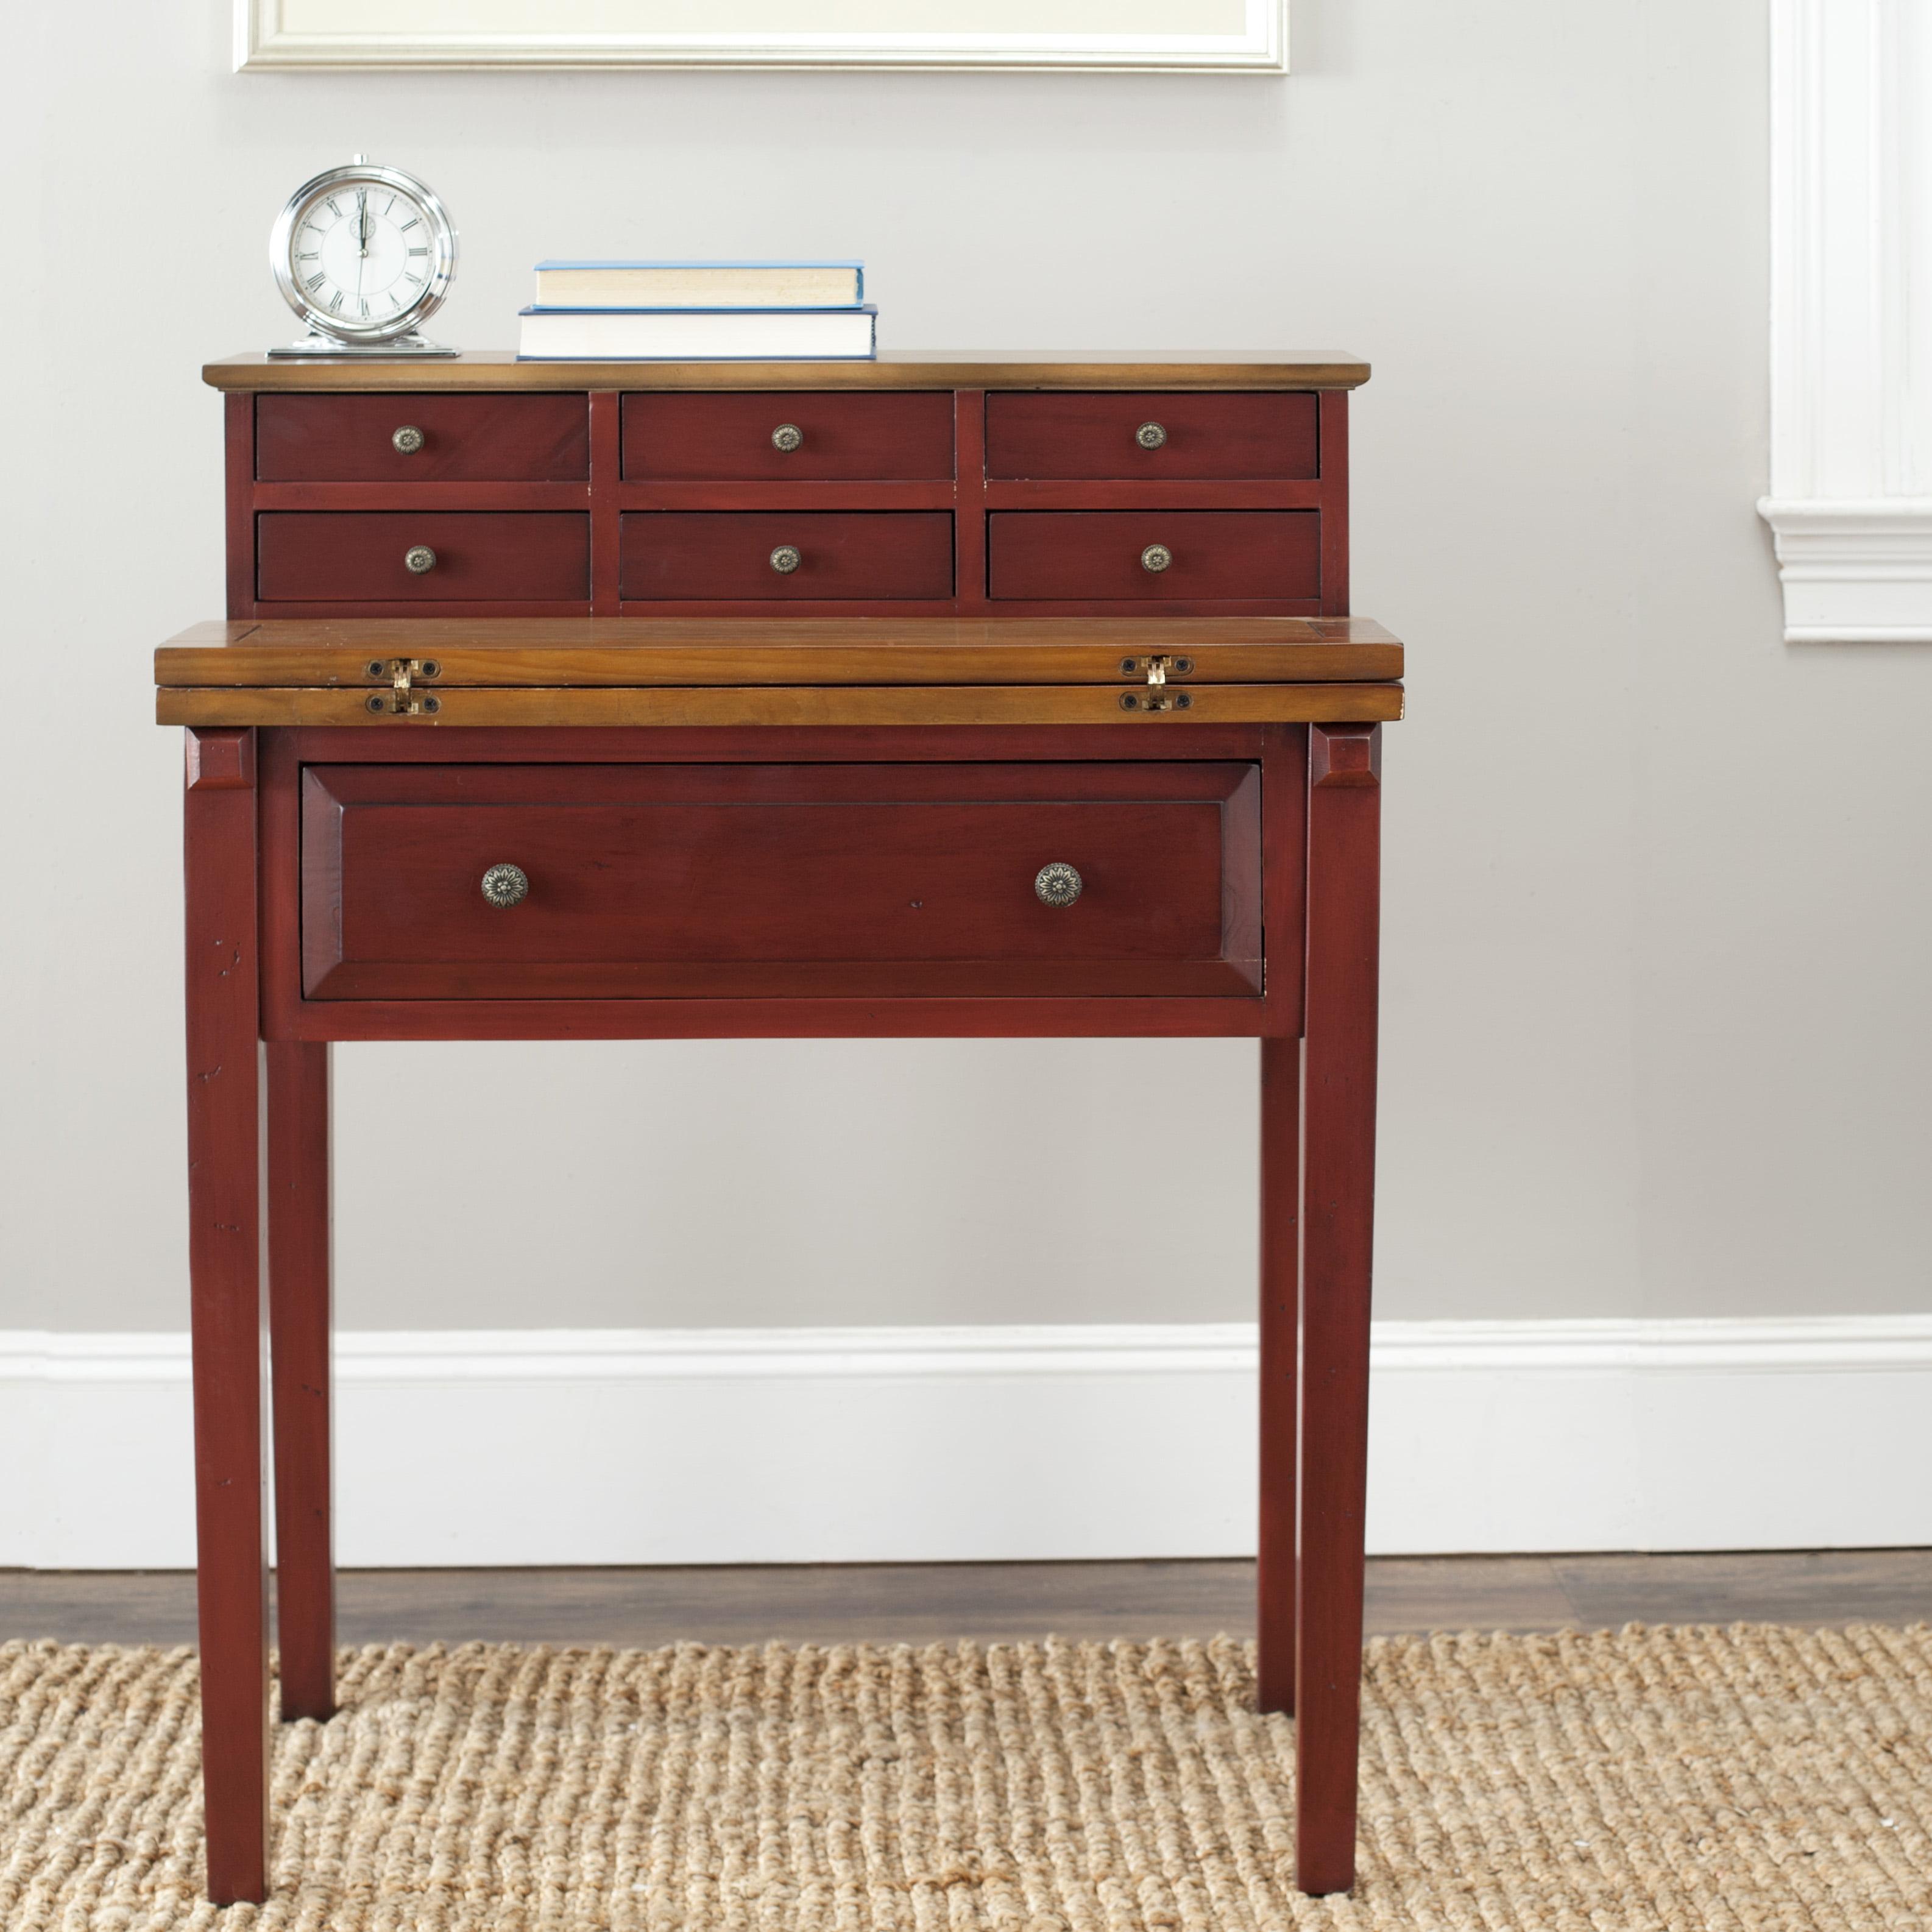 Safavieh Abigail Fold Down Desk by Safavieh